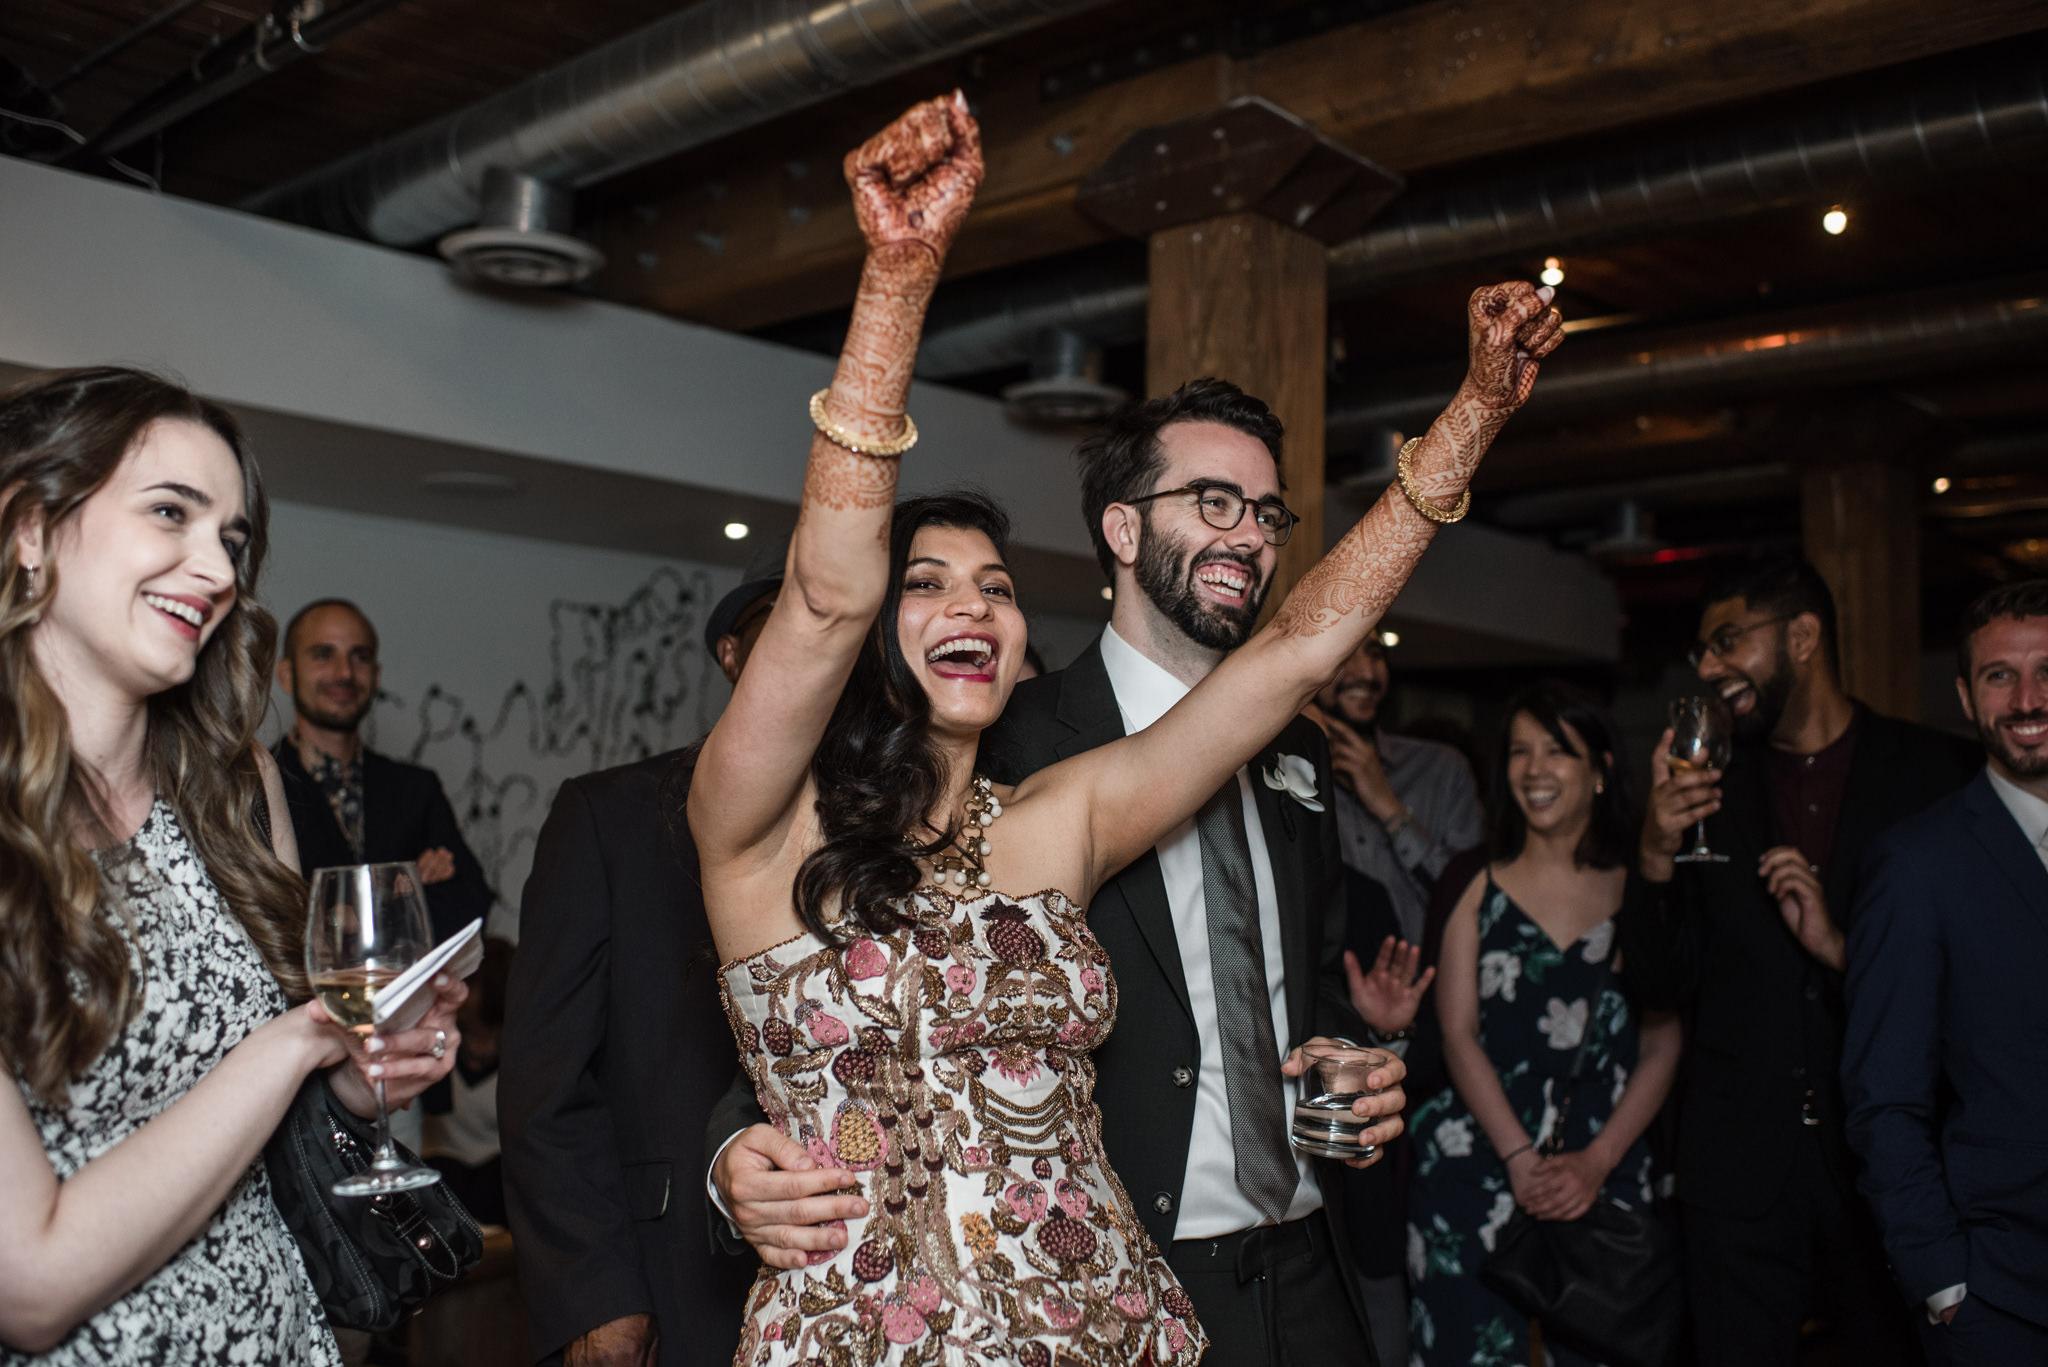 039-bride-groom-reception-documentary-photography-hotel-ocho.jpg